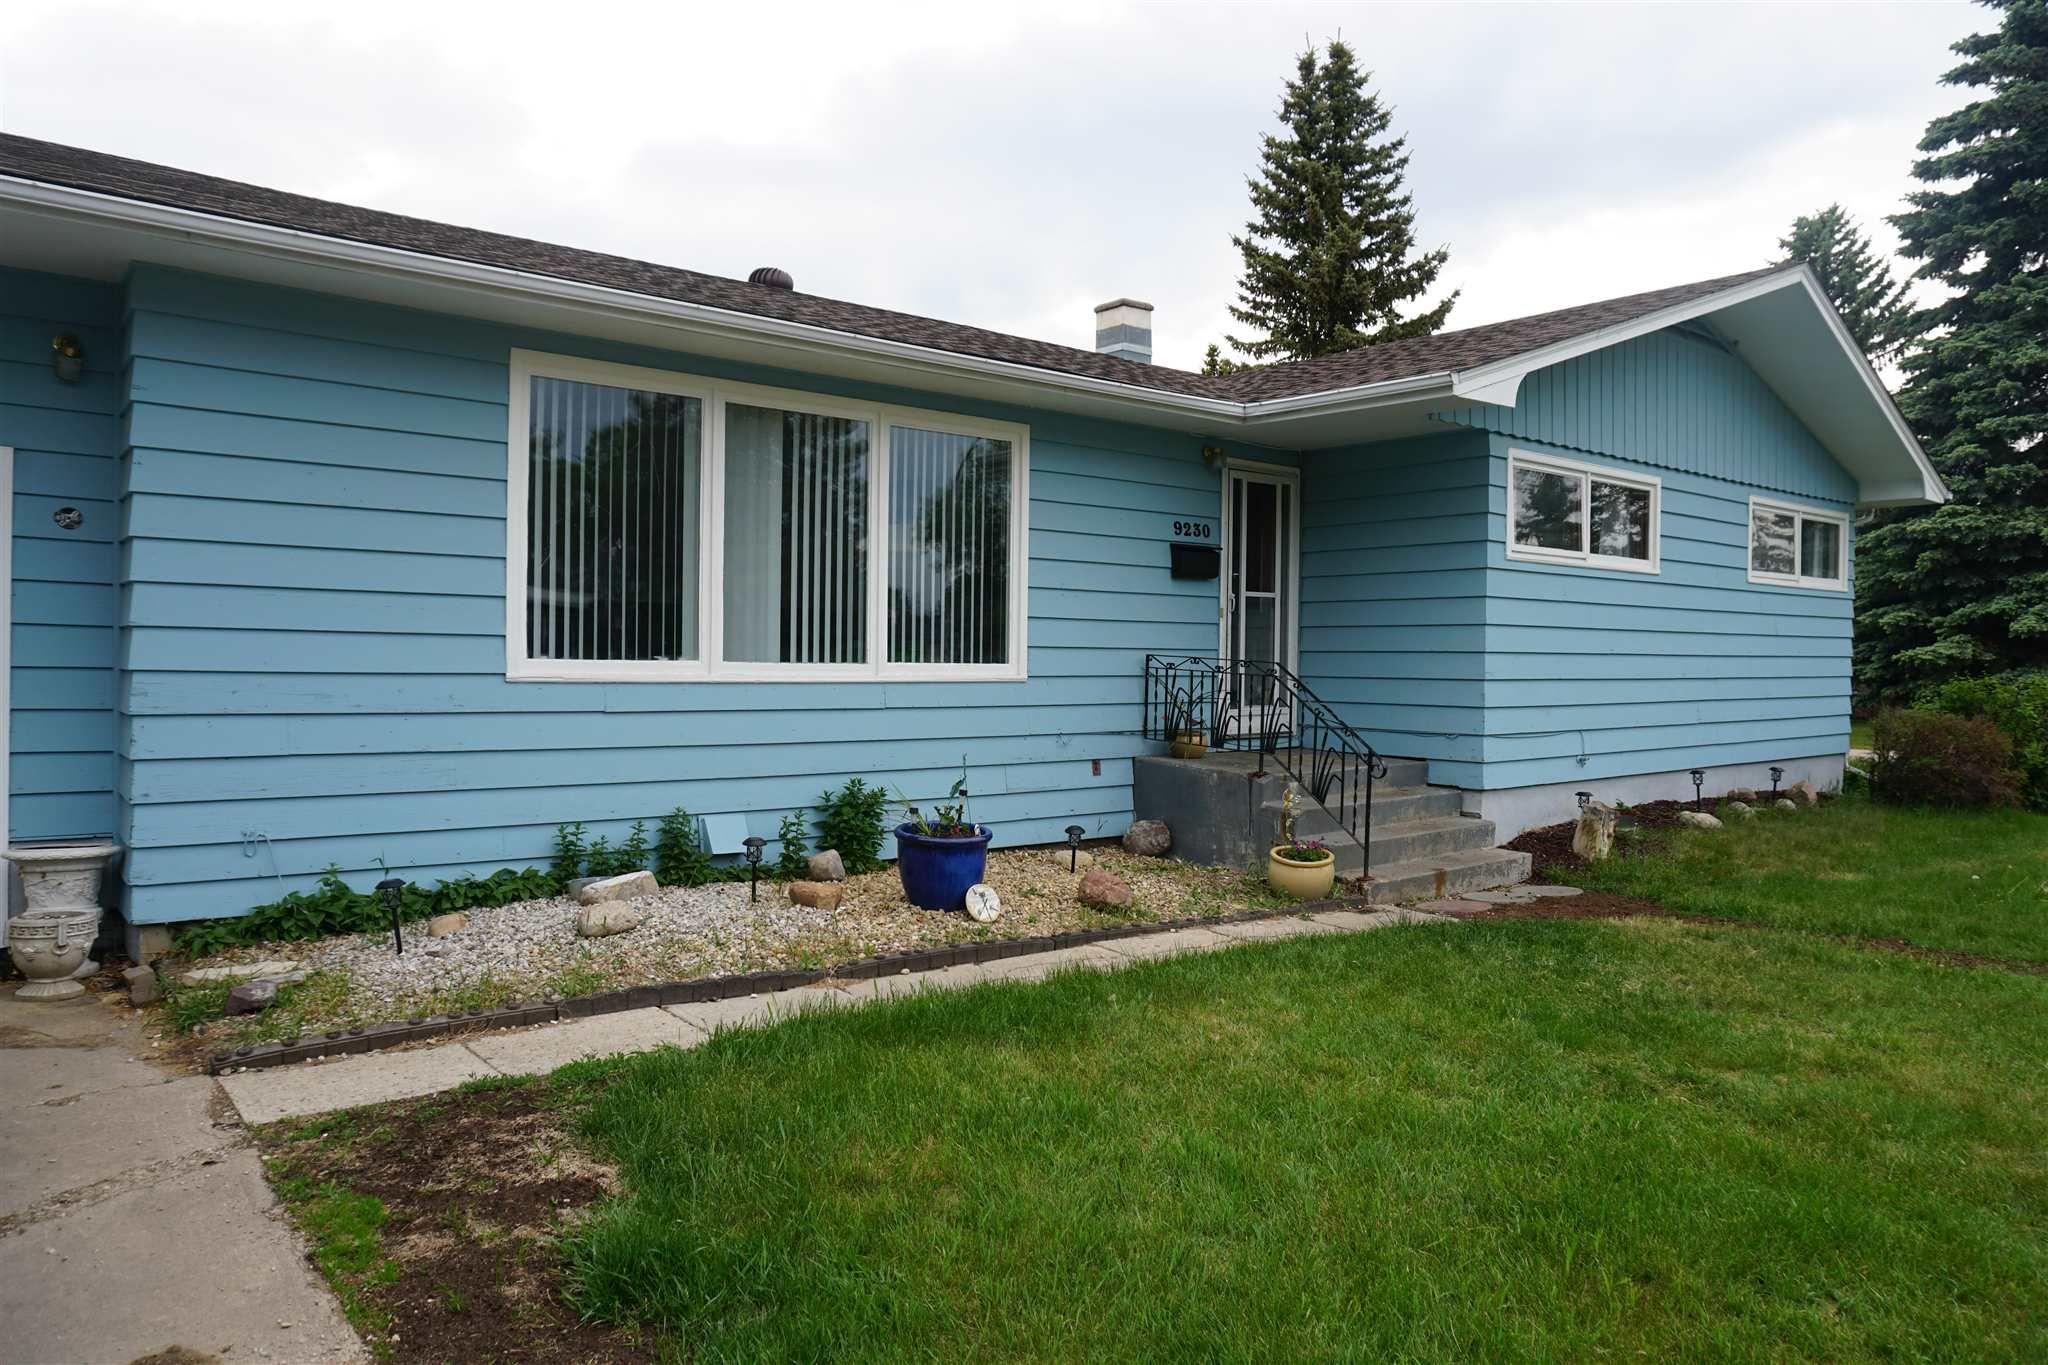 Main Photo: 9230 159 Street in Edmonton: Zone 22 House for sale : MLS®# E4248917